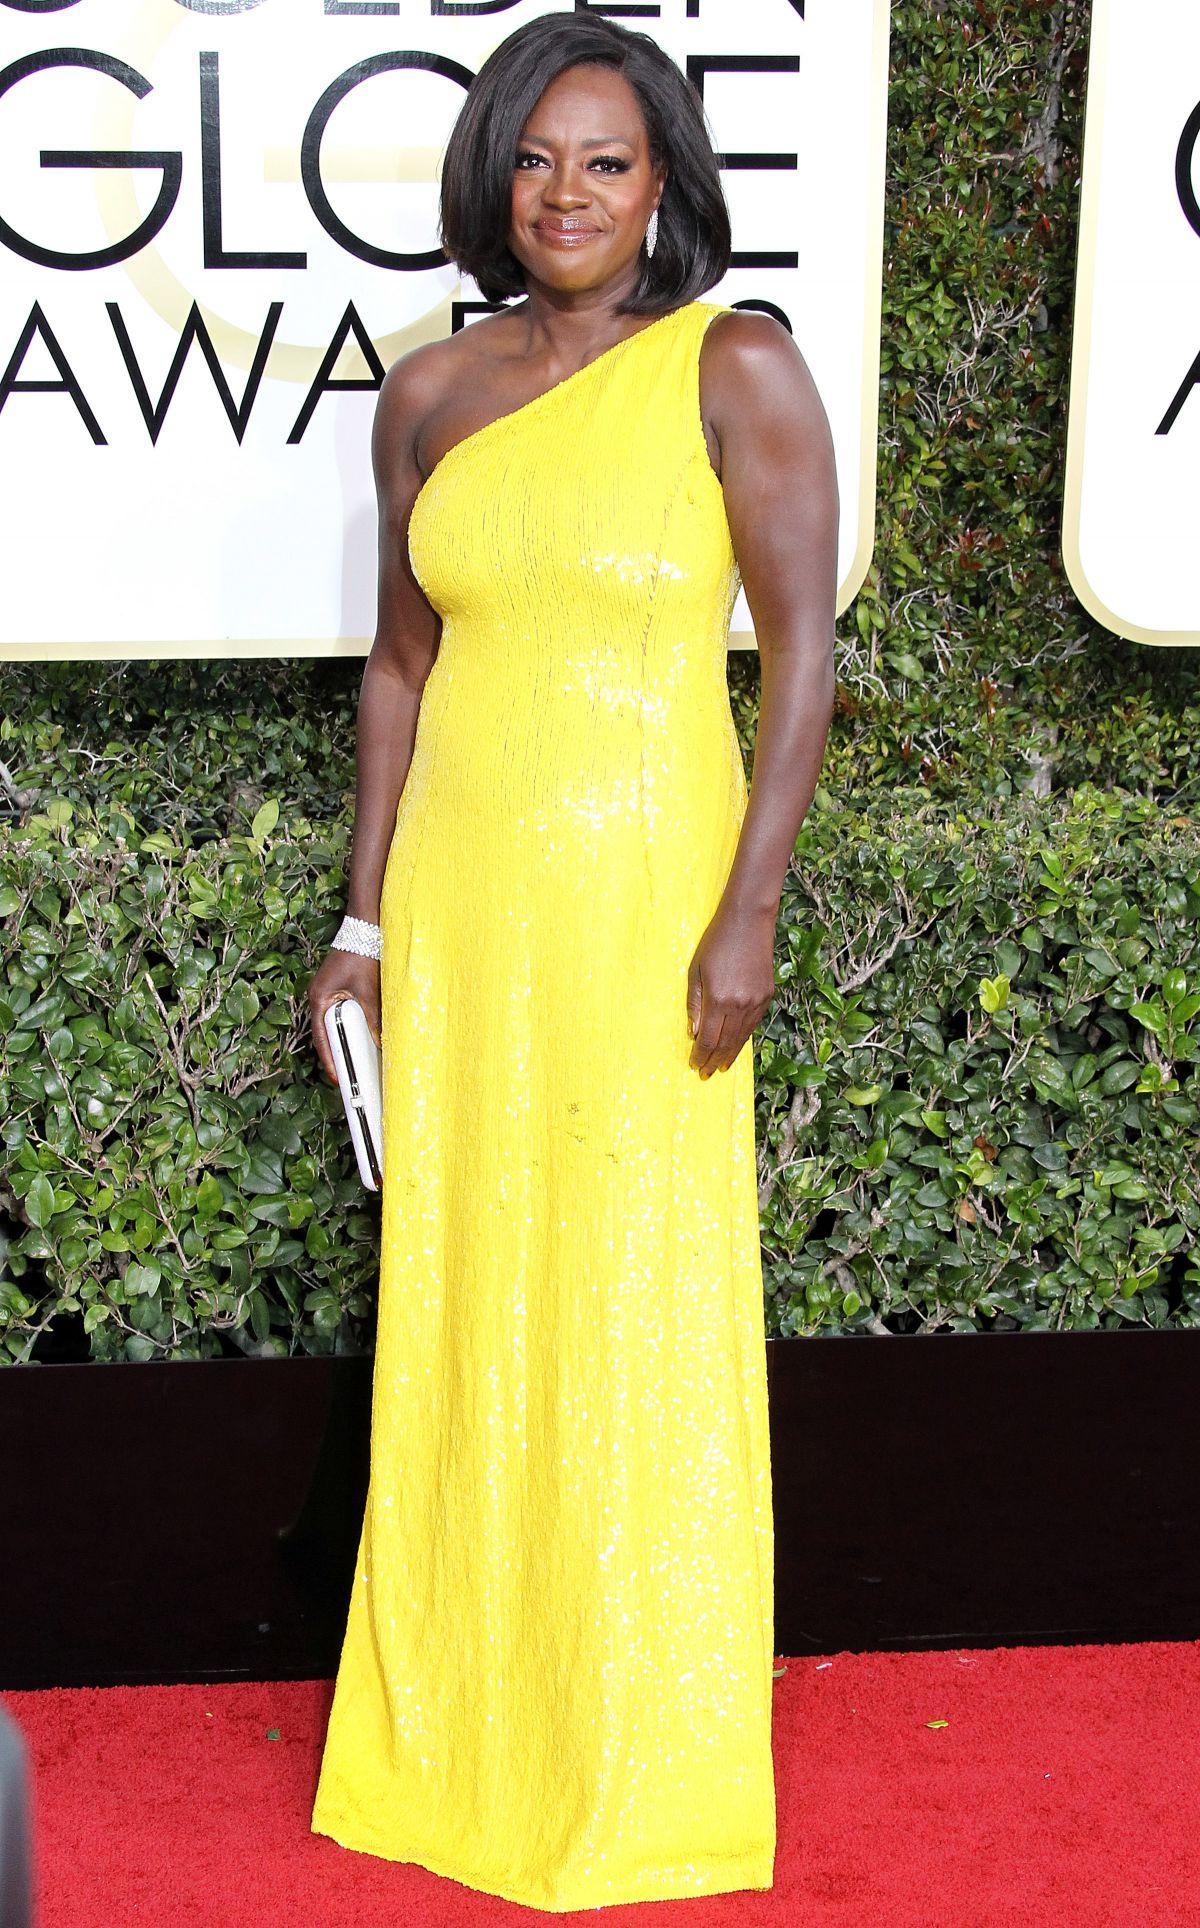 VIOLA DAVIS at 74th Annual Golden Globe Awards in Beverly Hills 01/08/2017